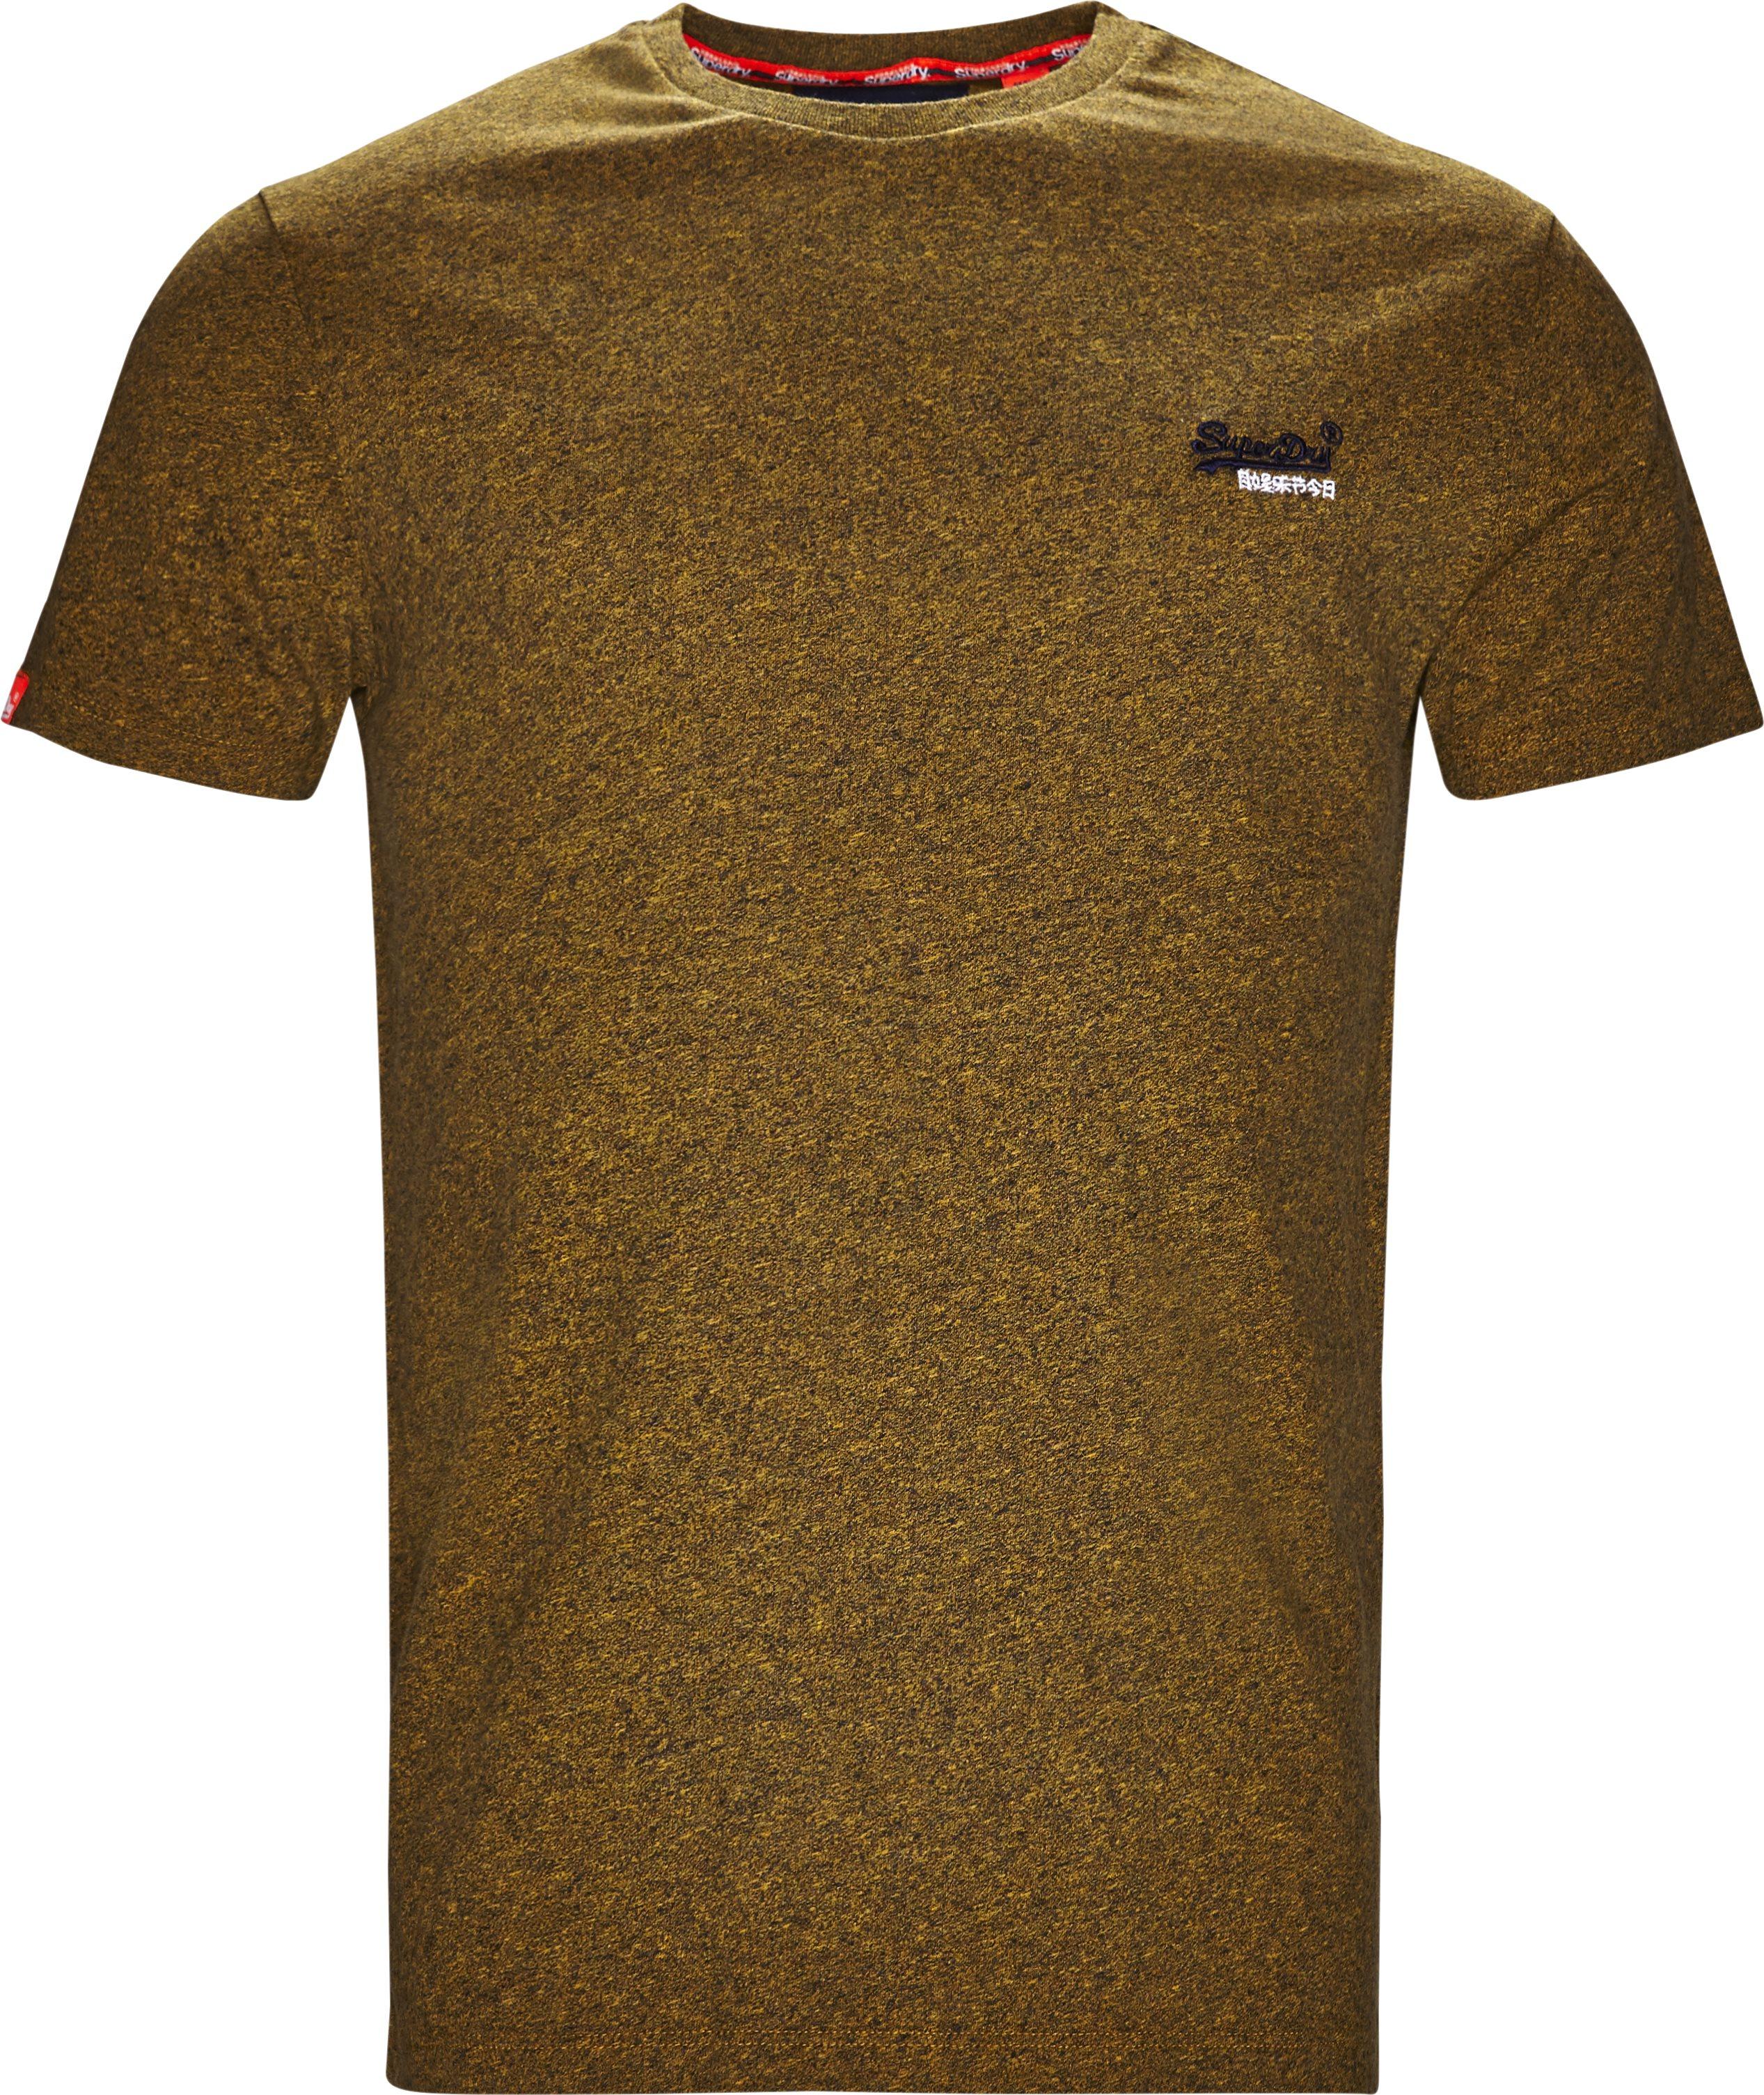 M1000 - T-shirts - Regular fit - Gul